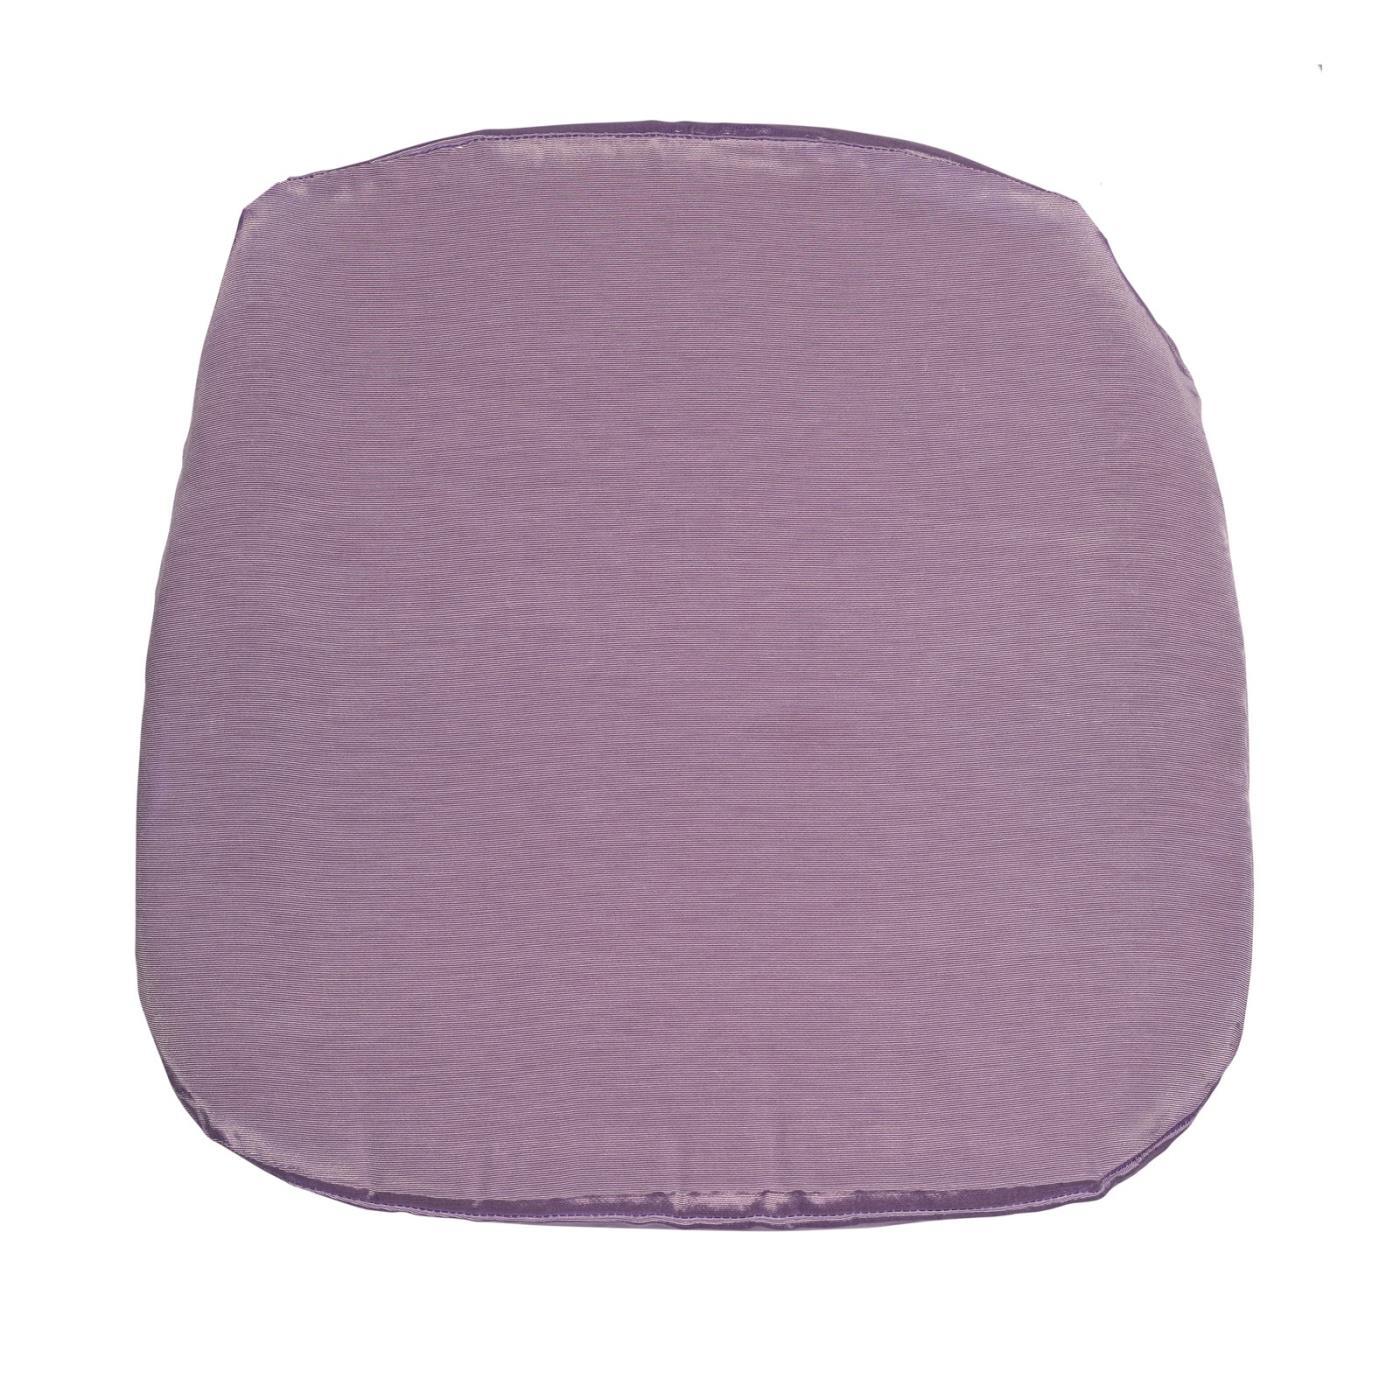 Bengaline Seat Cushion - Lilac